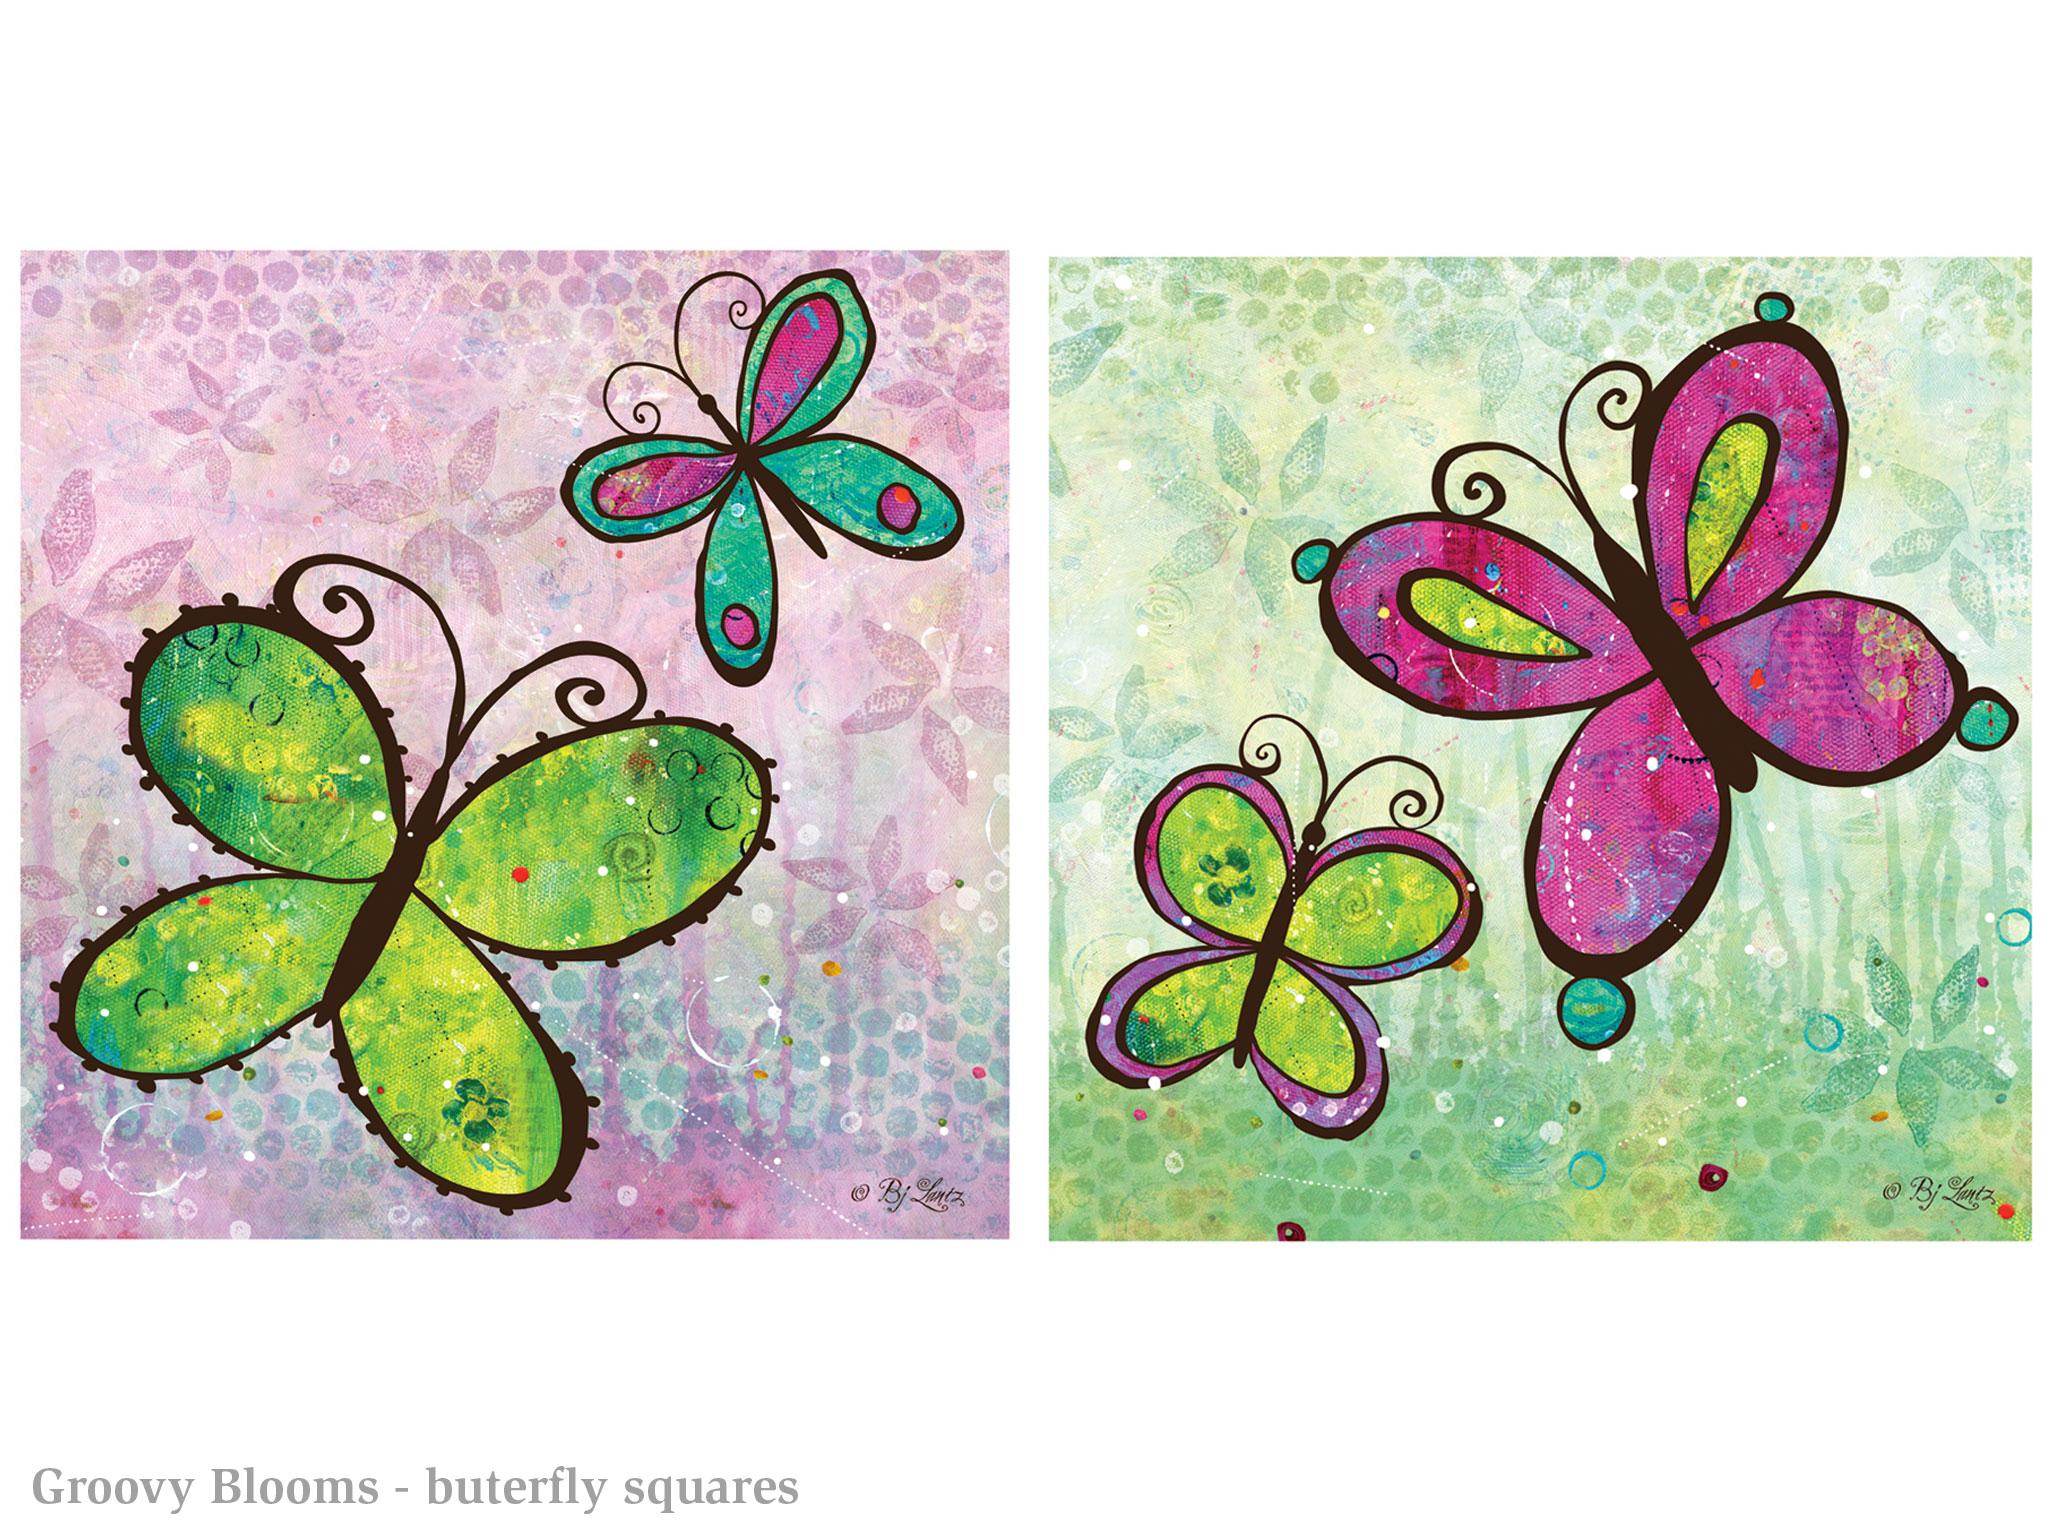 GroovyBlooms_BJLantz_butterflysquares.jpg